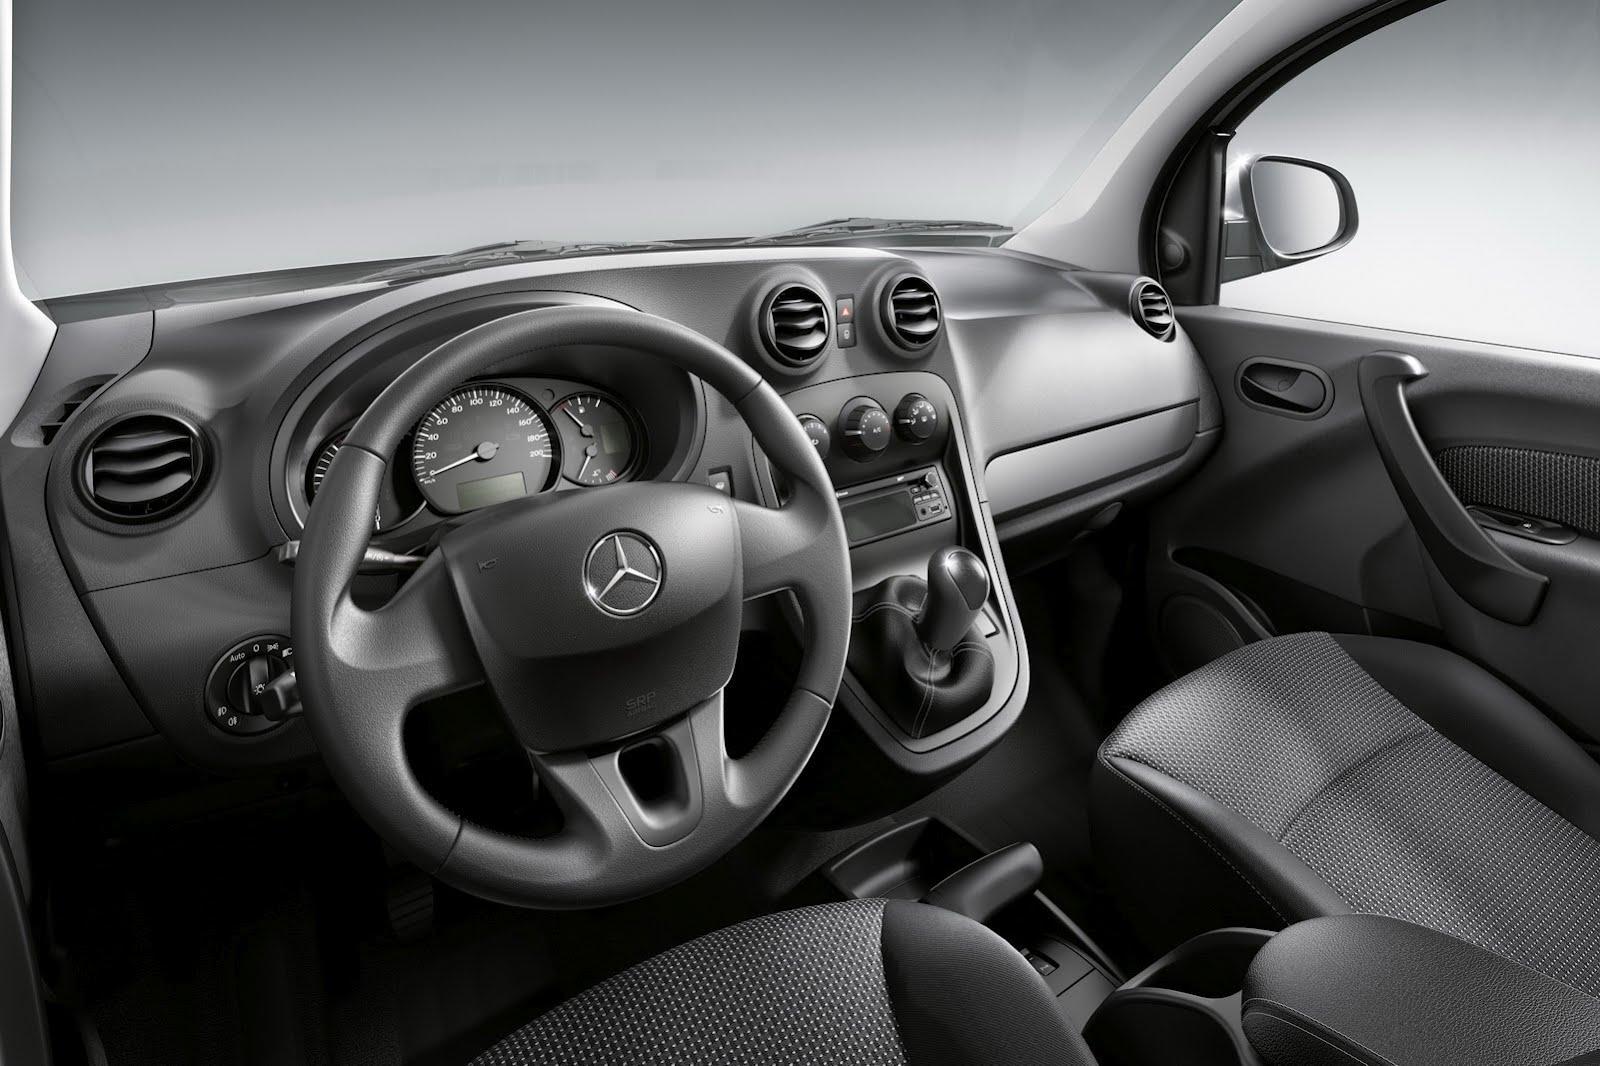 http://www.justdrive.ru/uploads/posts/2012-04/1334661778_2013-Mercedes-Citan-5.jpg